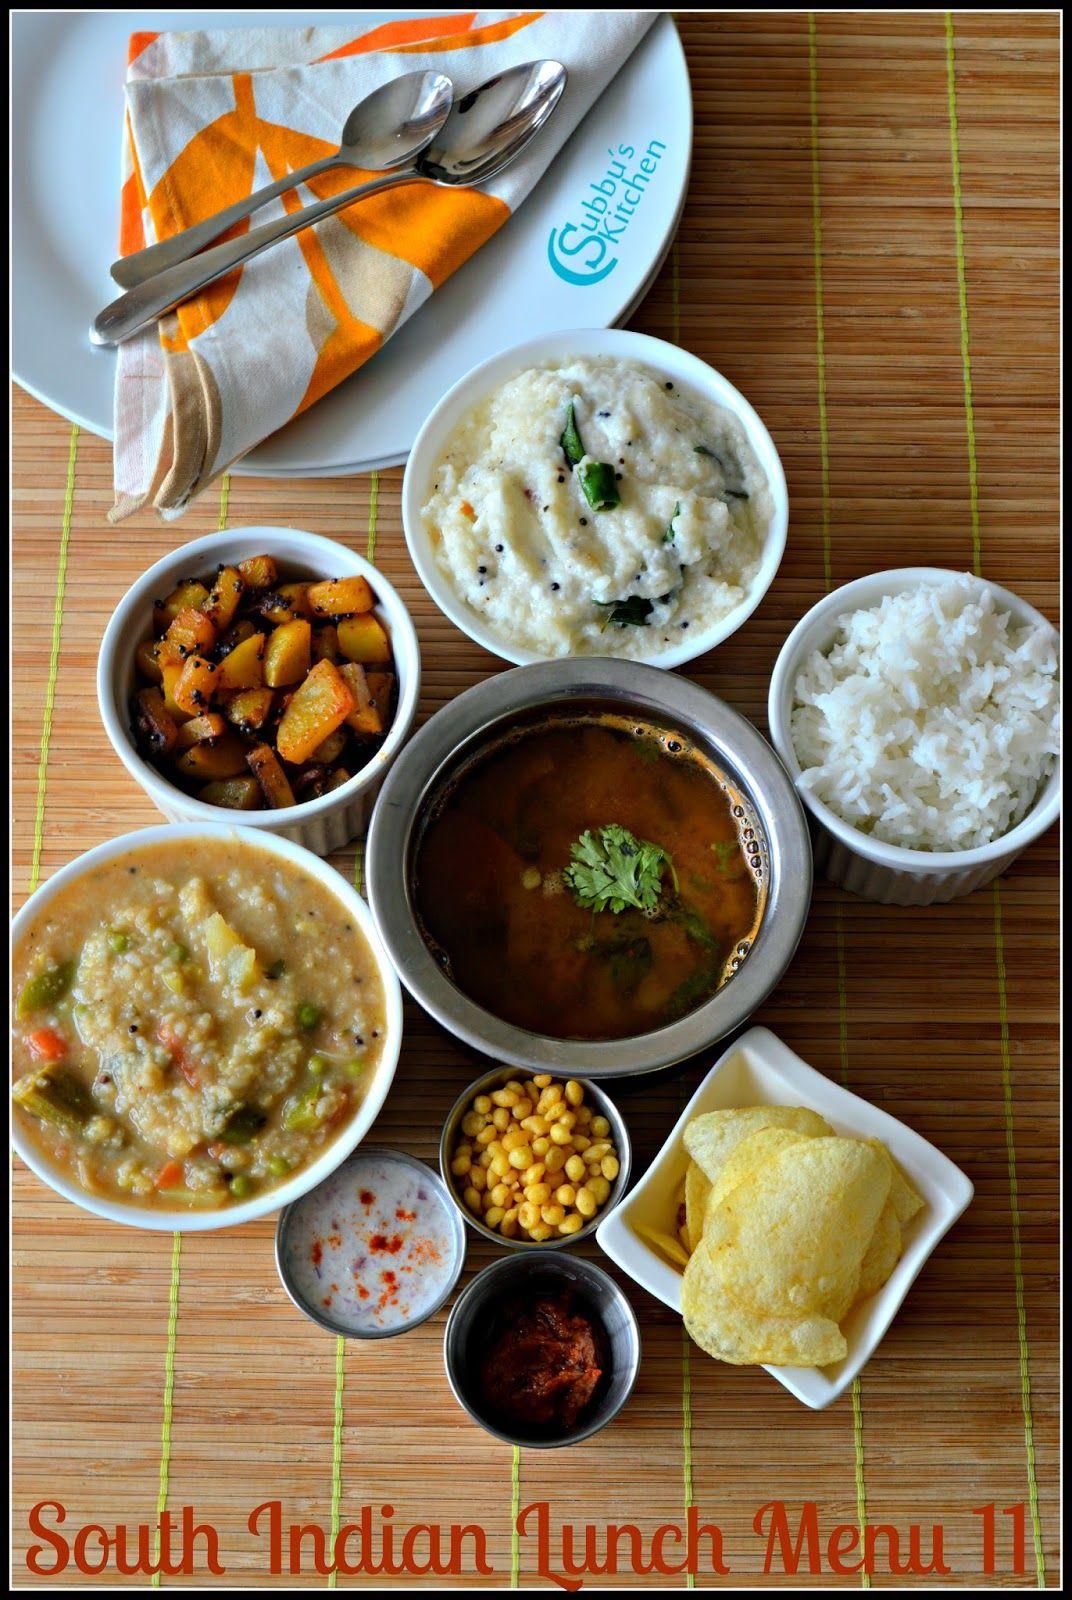 South Indian Lunch Menu 12 Bisibelabath Kalyana Rasam Potato